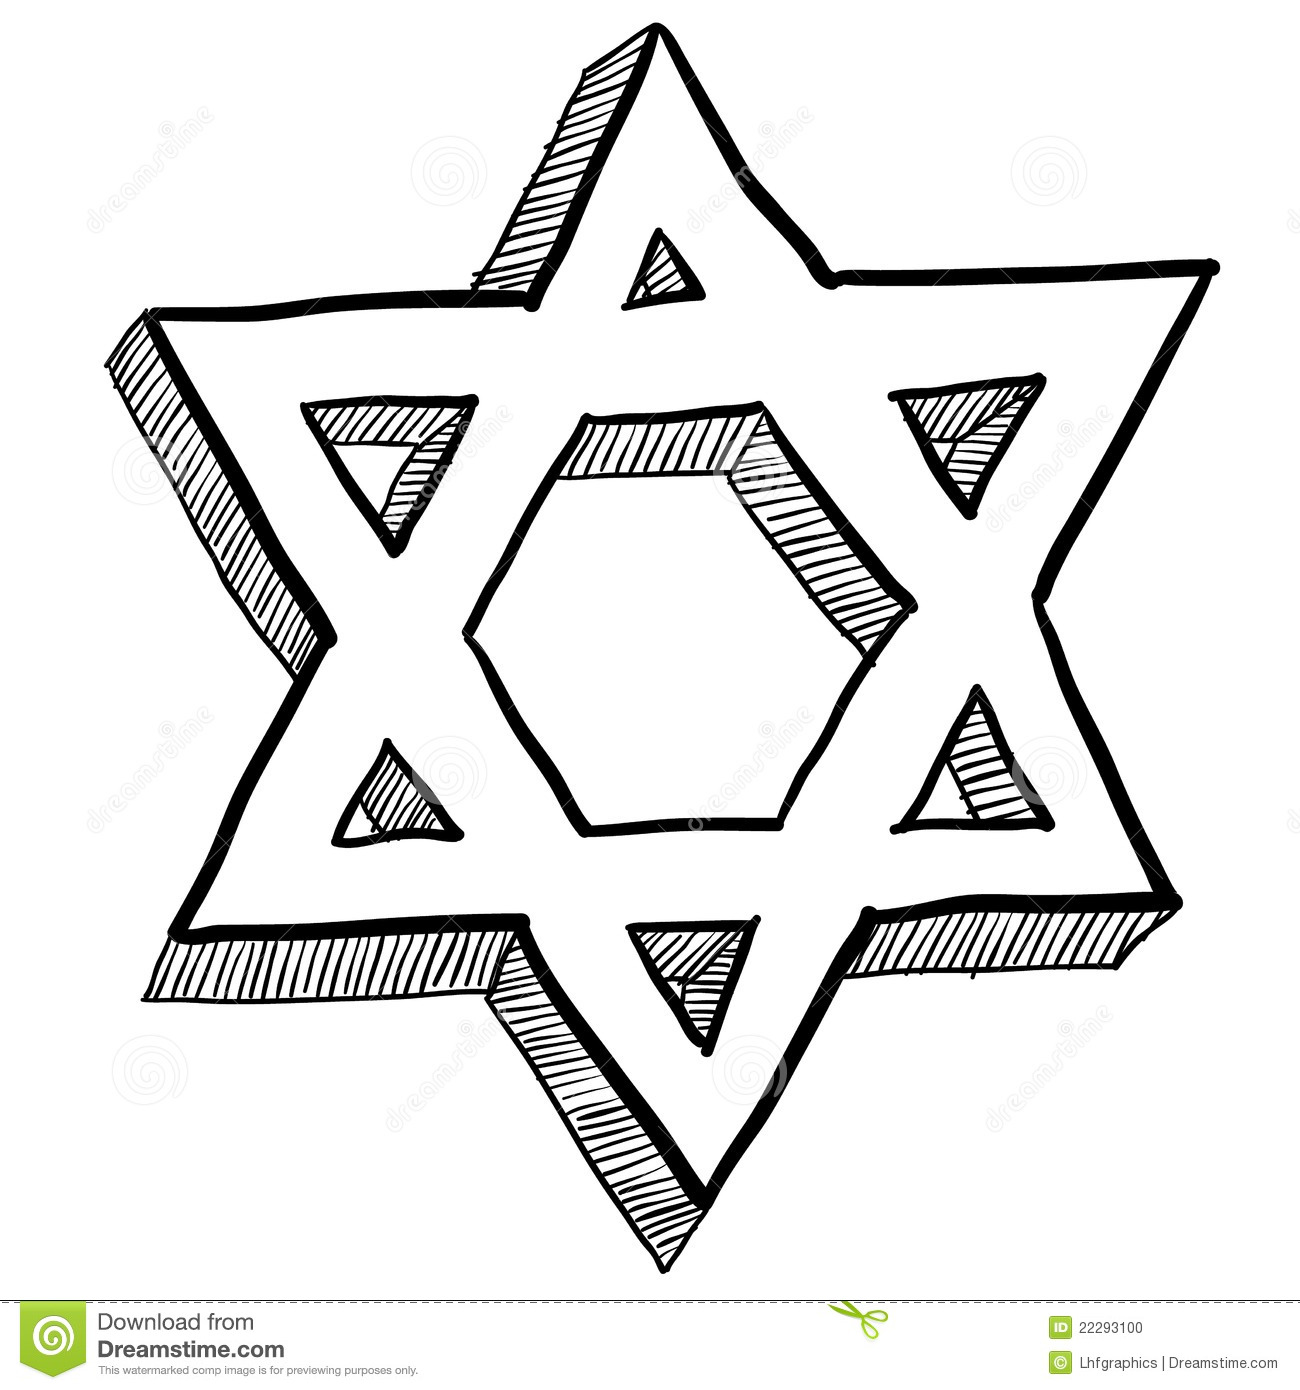 Artistic jewish star clipart vector transparent library Jewish Star Of David Illustration Stock Photo - Image: 22293100 vector transparent library